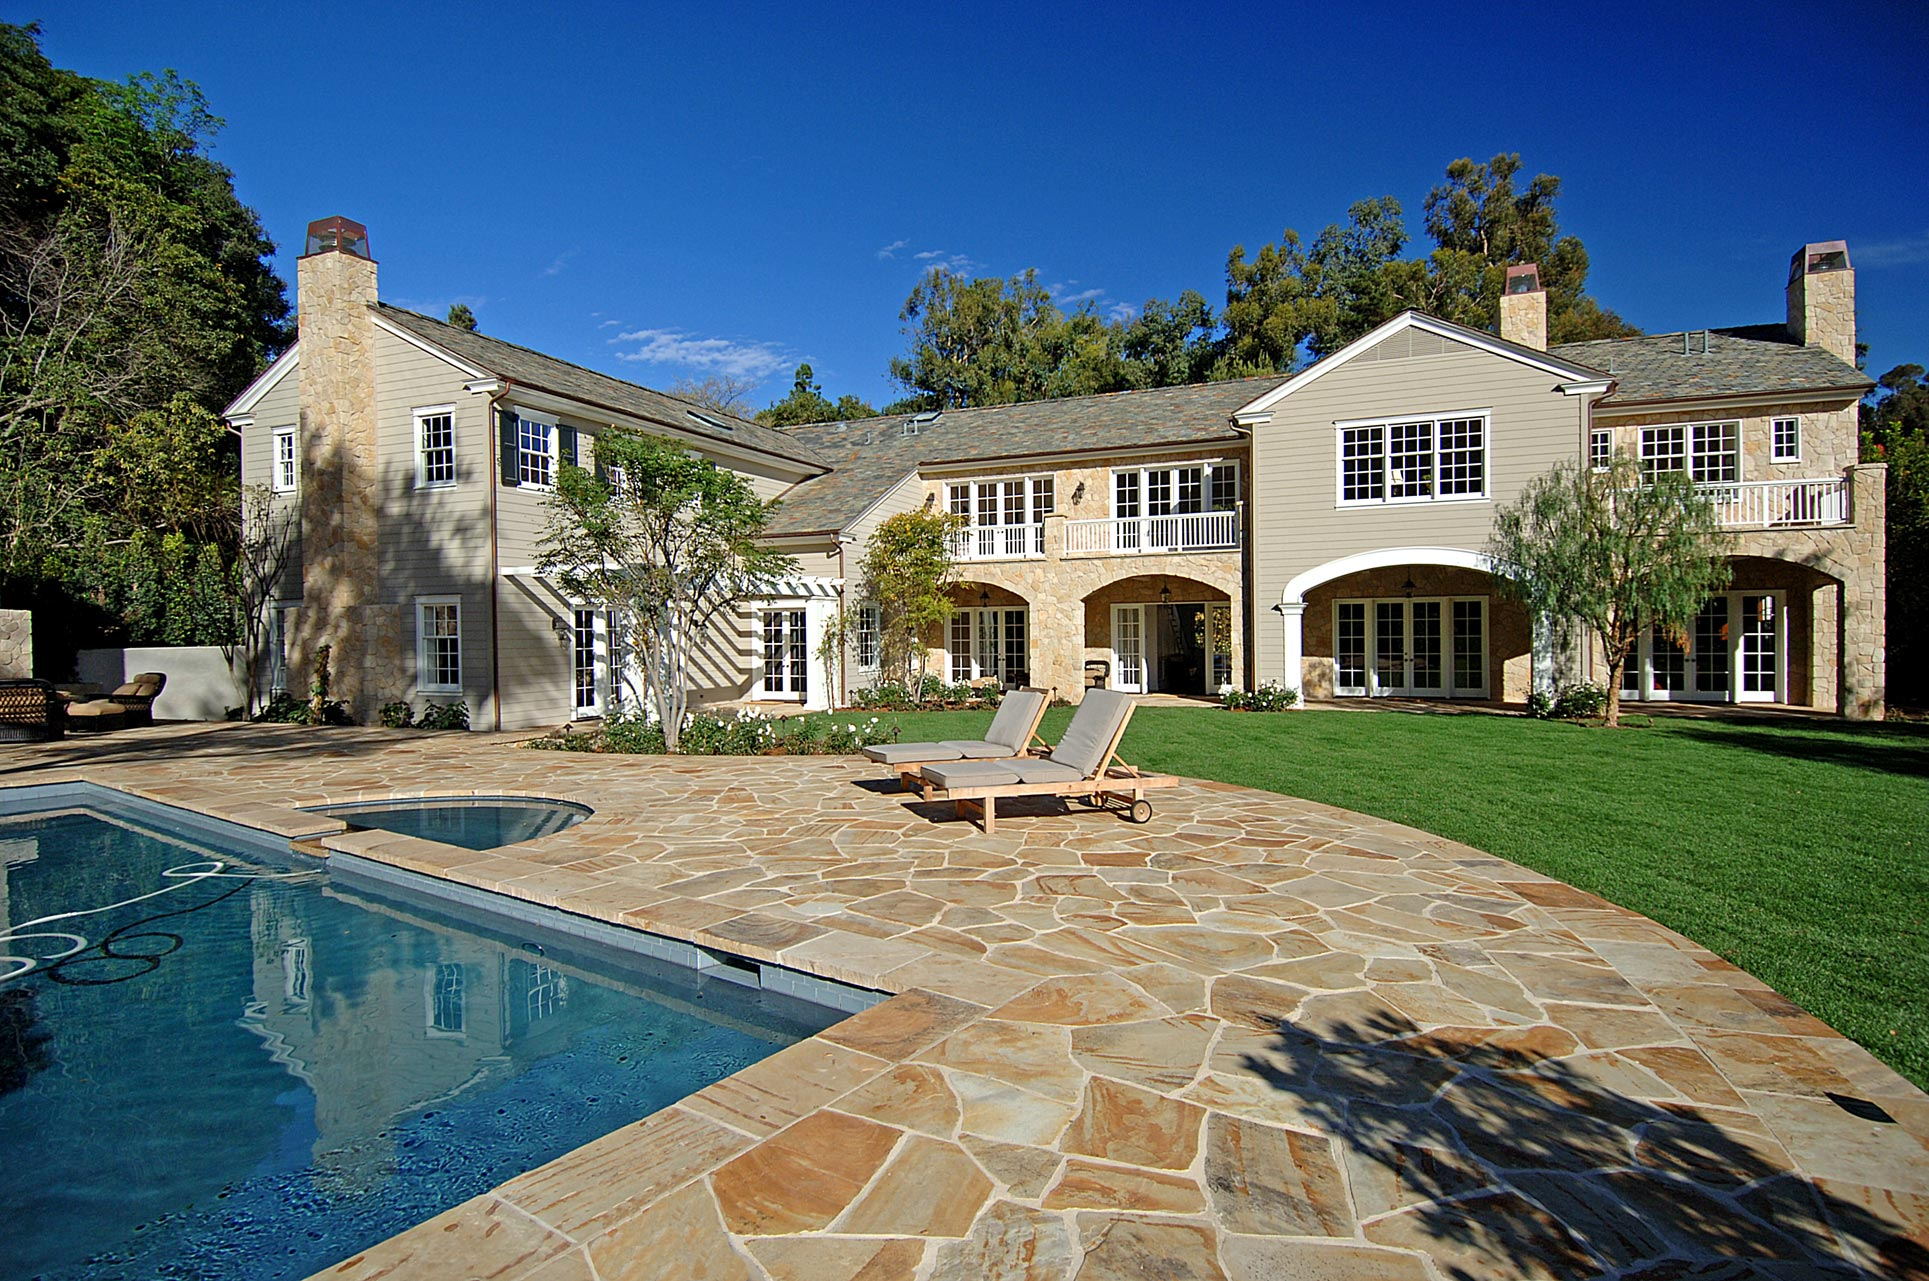 Contemporary-Farmhouse-Backyard-Pool-Premier-General-Contractors.jpg